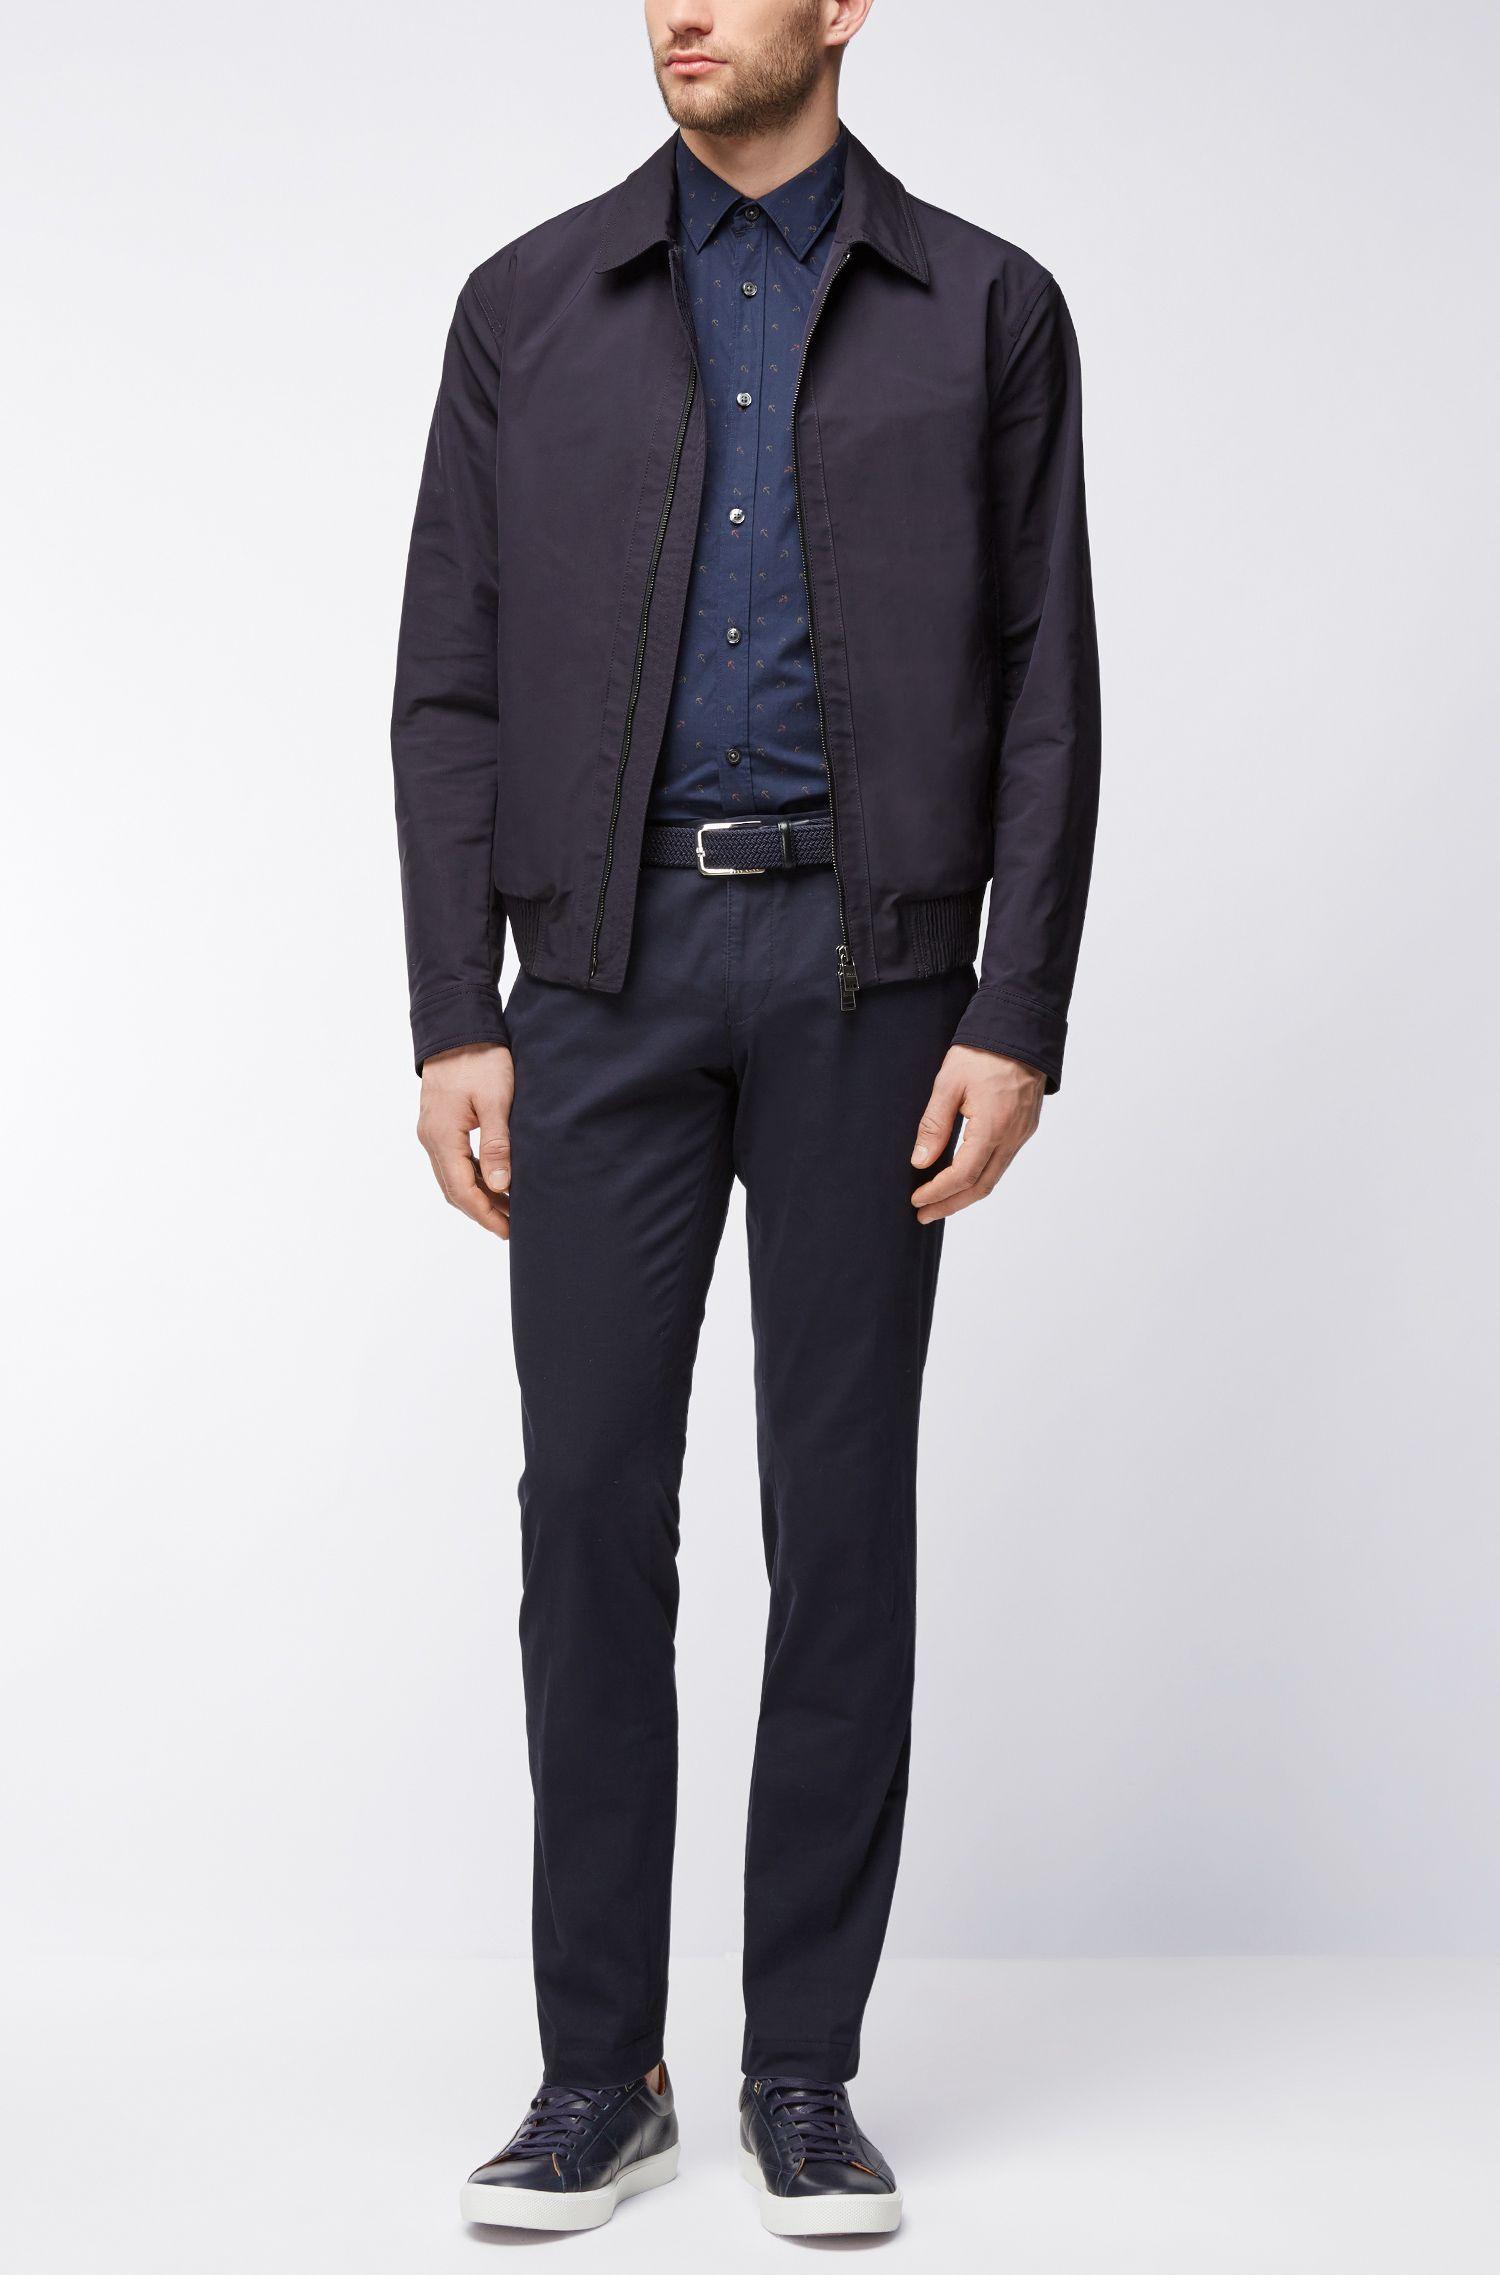 Anchor-Print Sport Shirt, Slim Fit | Ronn, Dark Blue